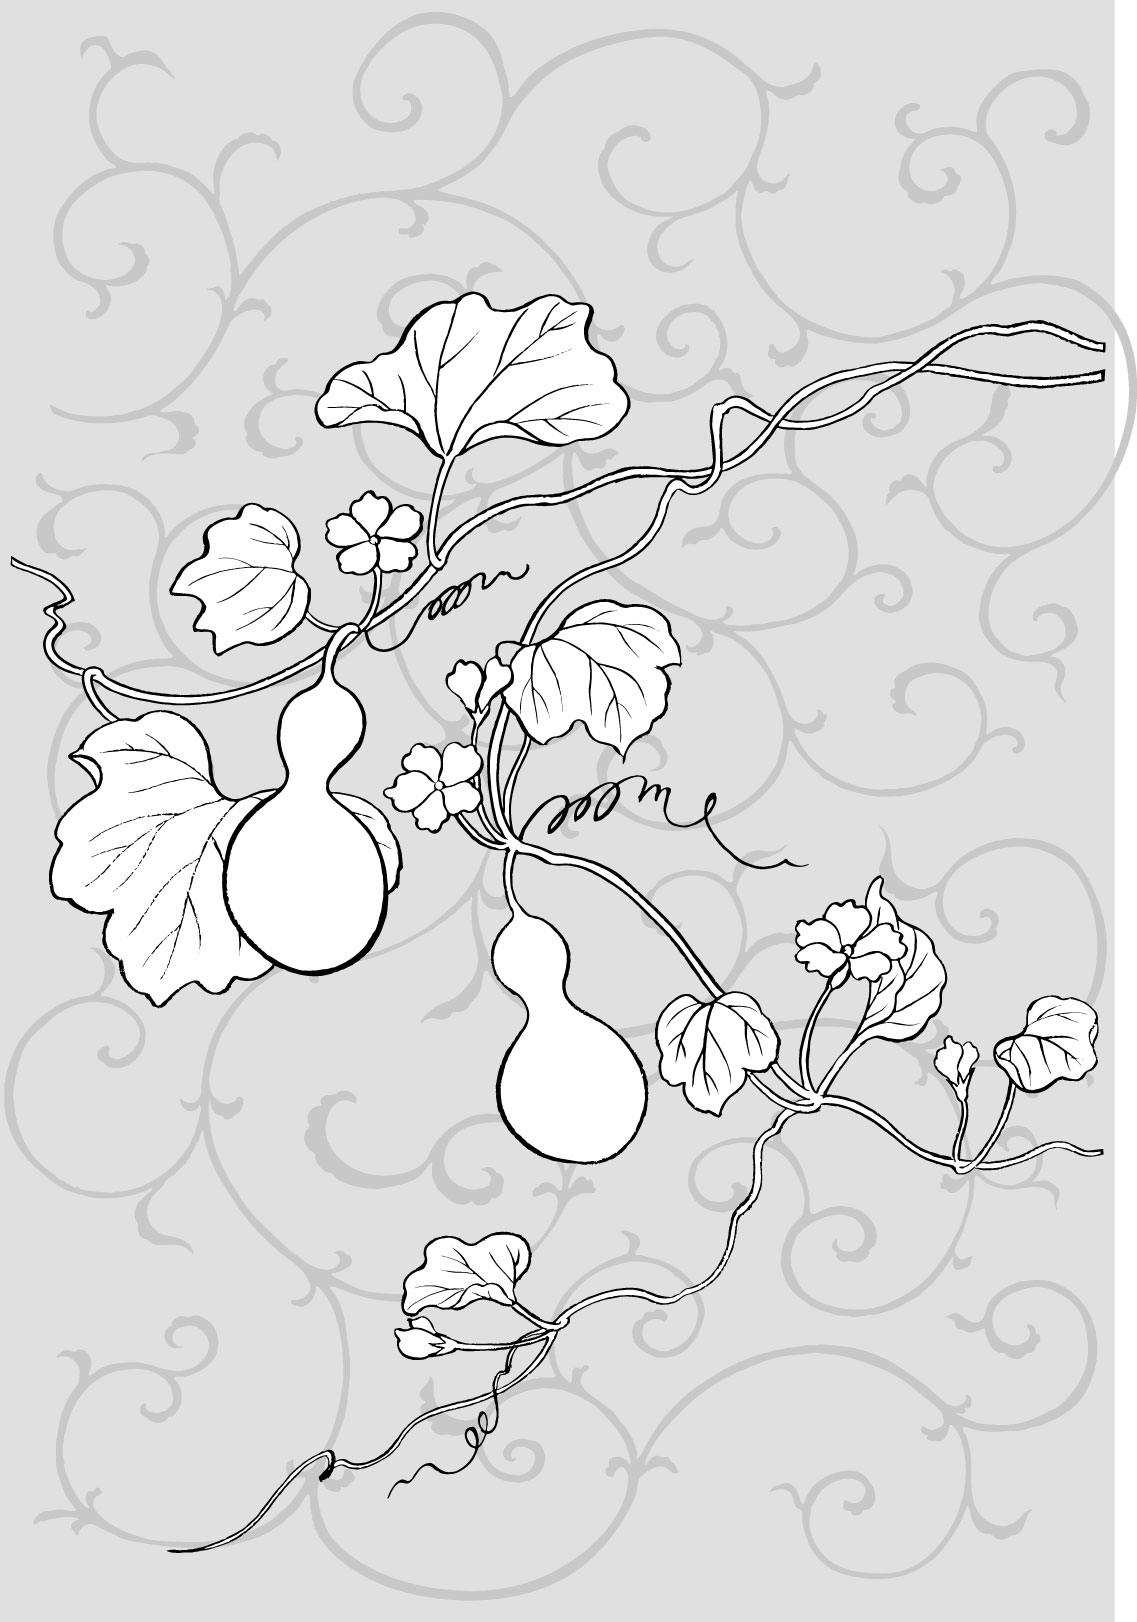 葫芦的折法图解